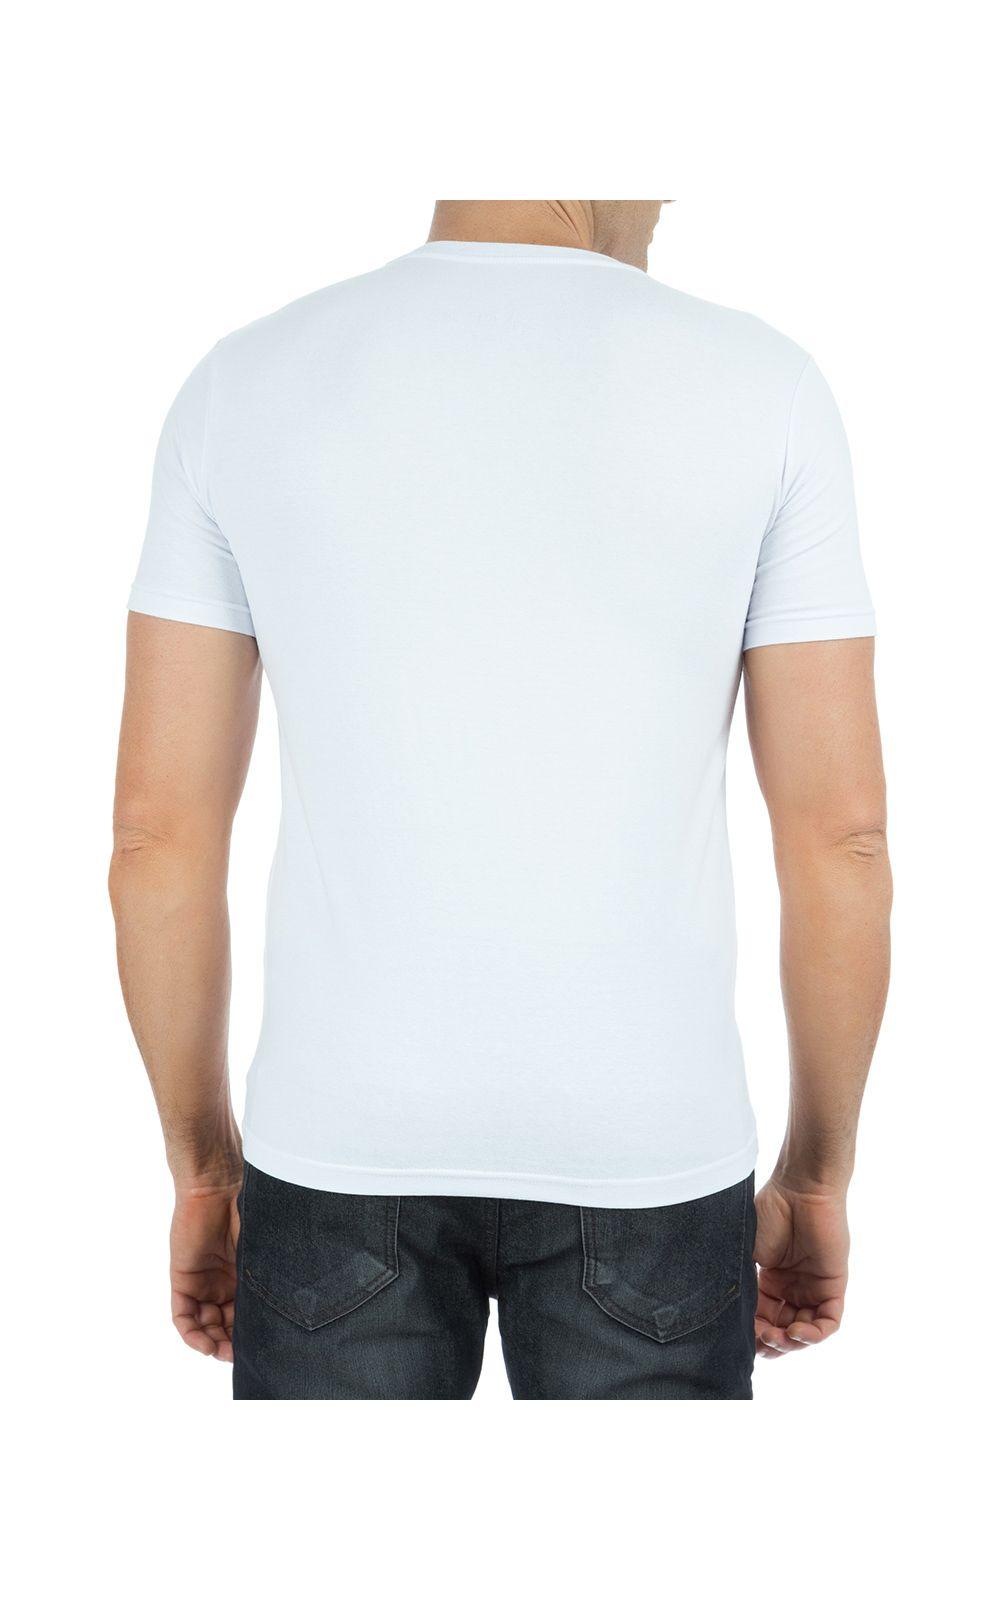 Foto 2 - Camiseta Masculina Branca Lisa